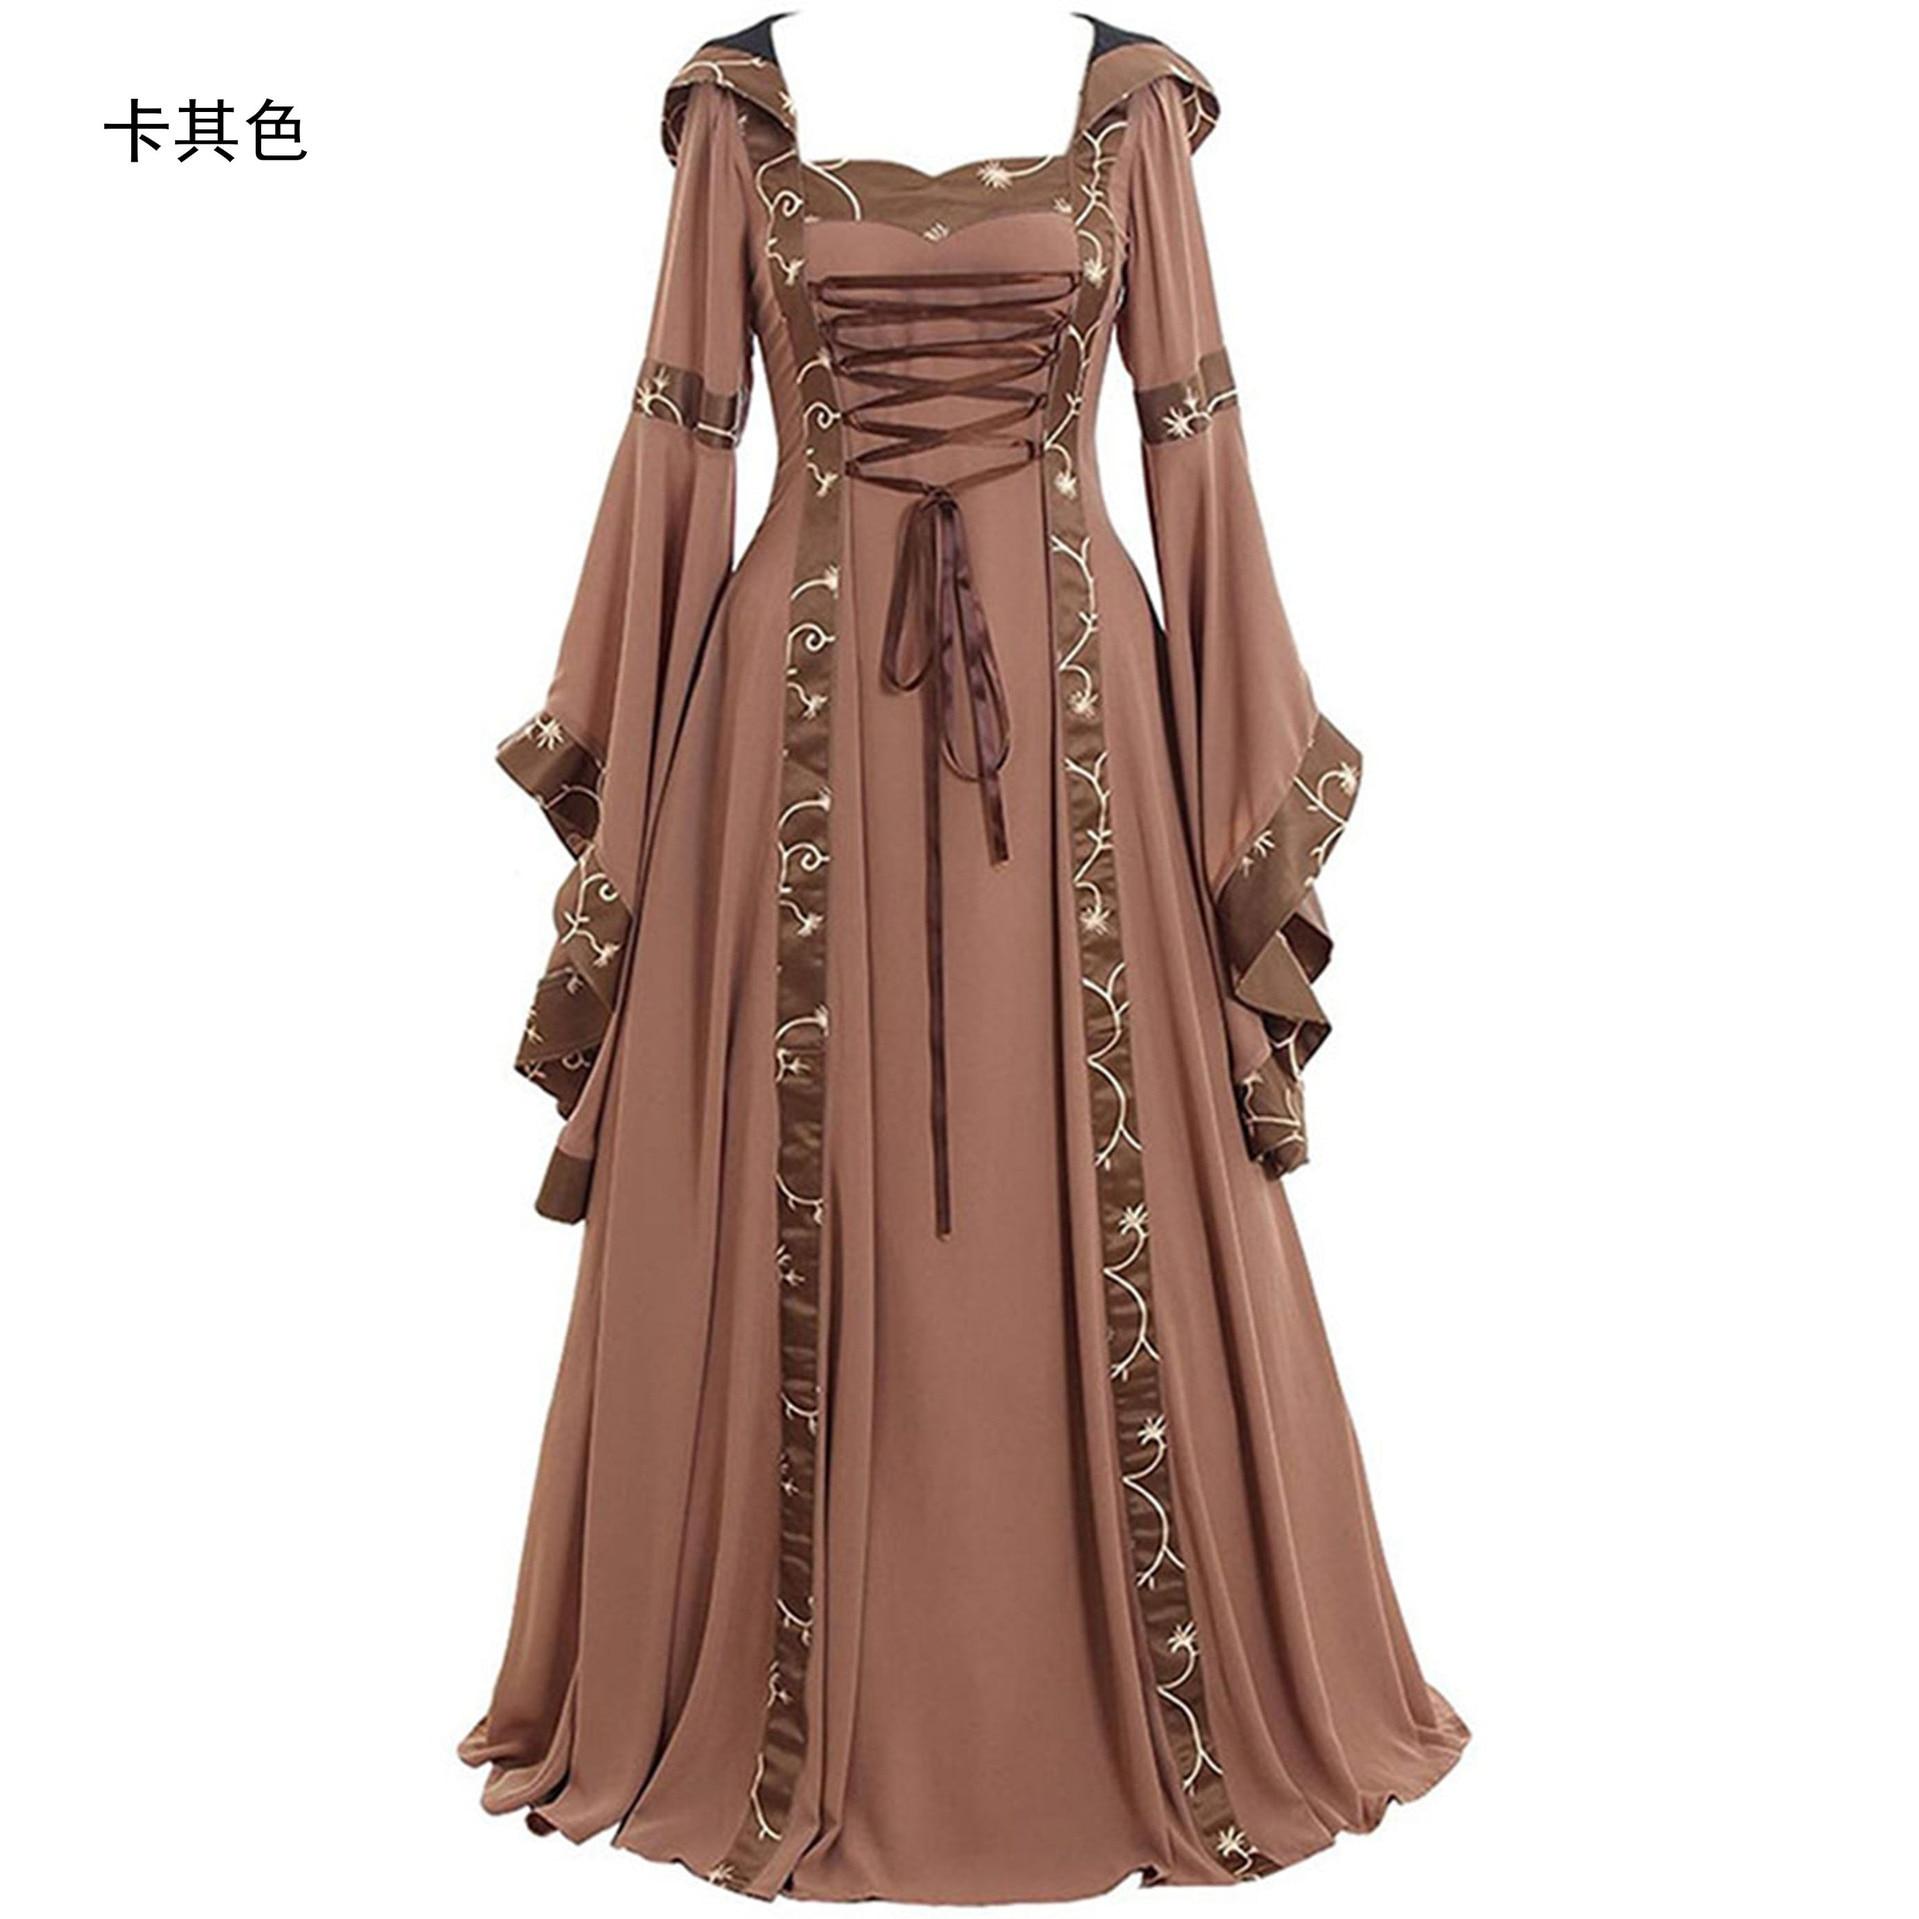 cosplay abad pertengahan istana putri gaun orang dewasa vintage pesta malam  gaun retro renaissance ekor kostum gaun plus ukuran kleid